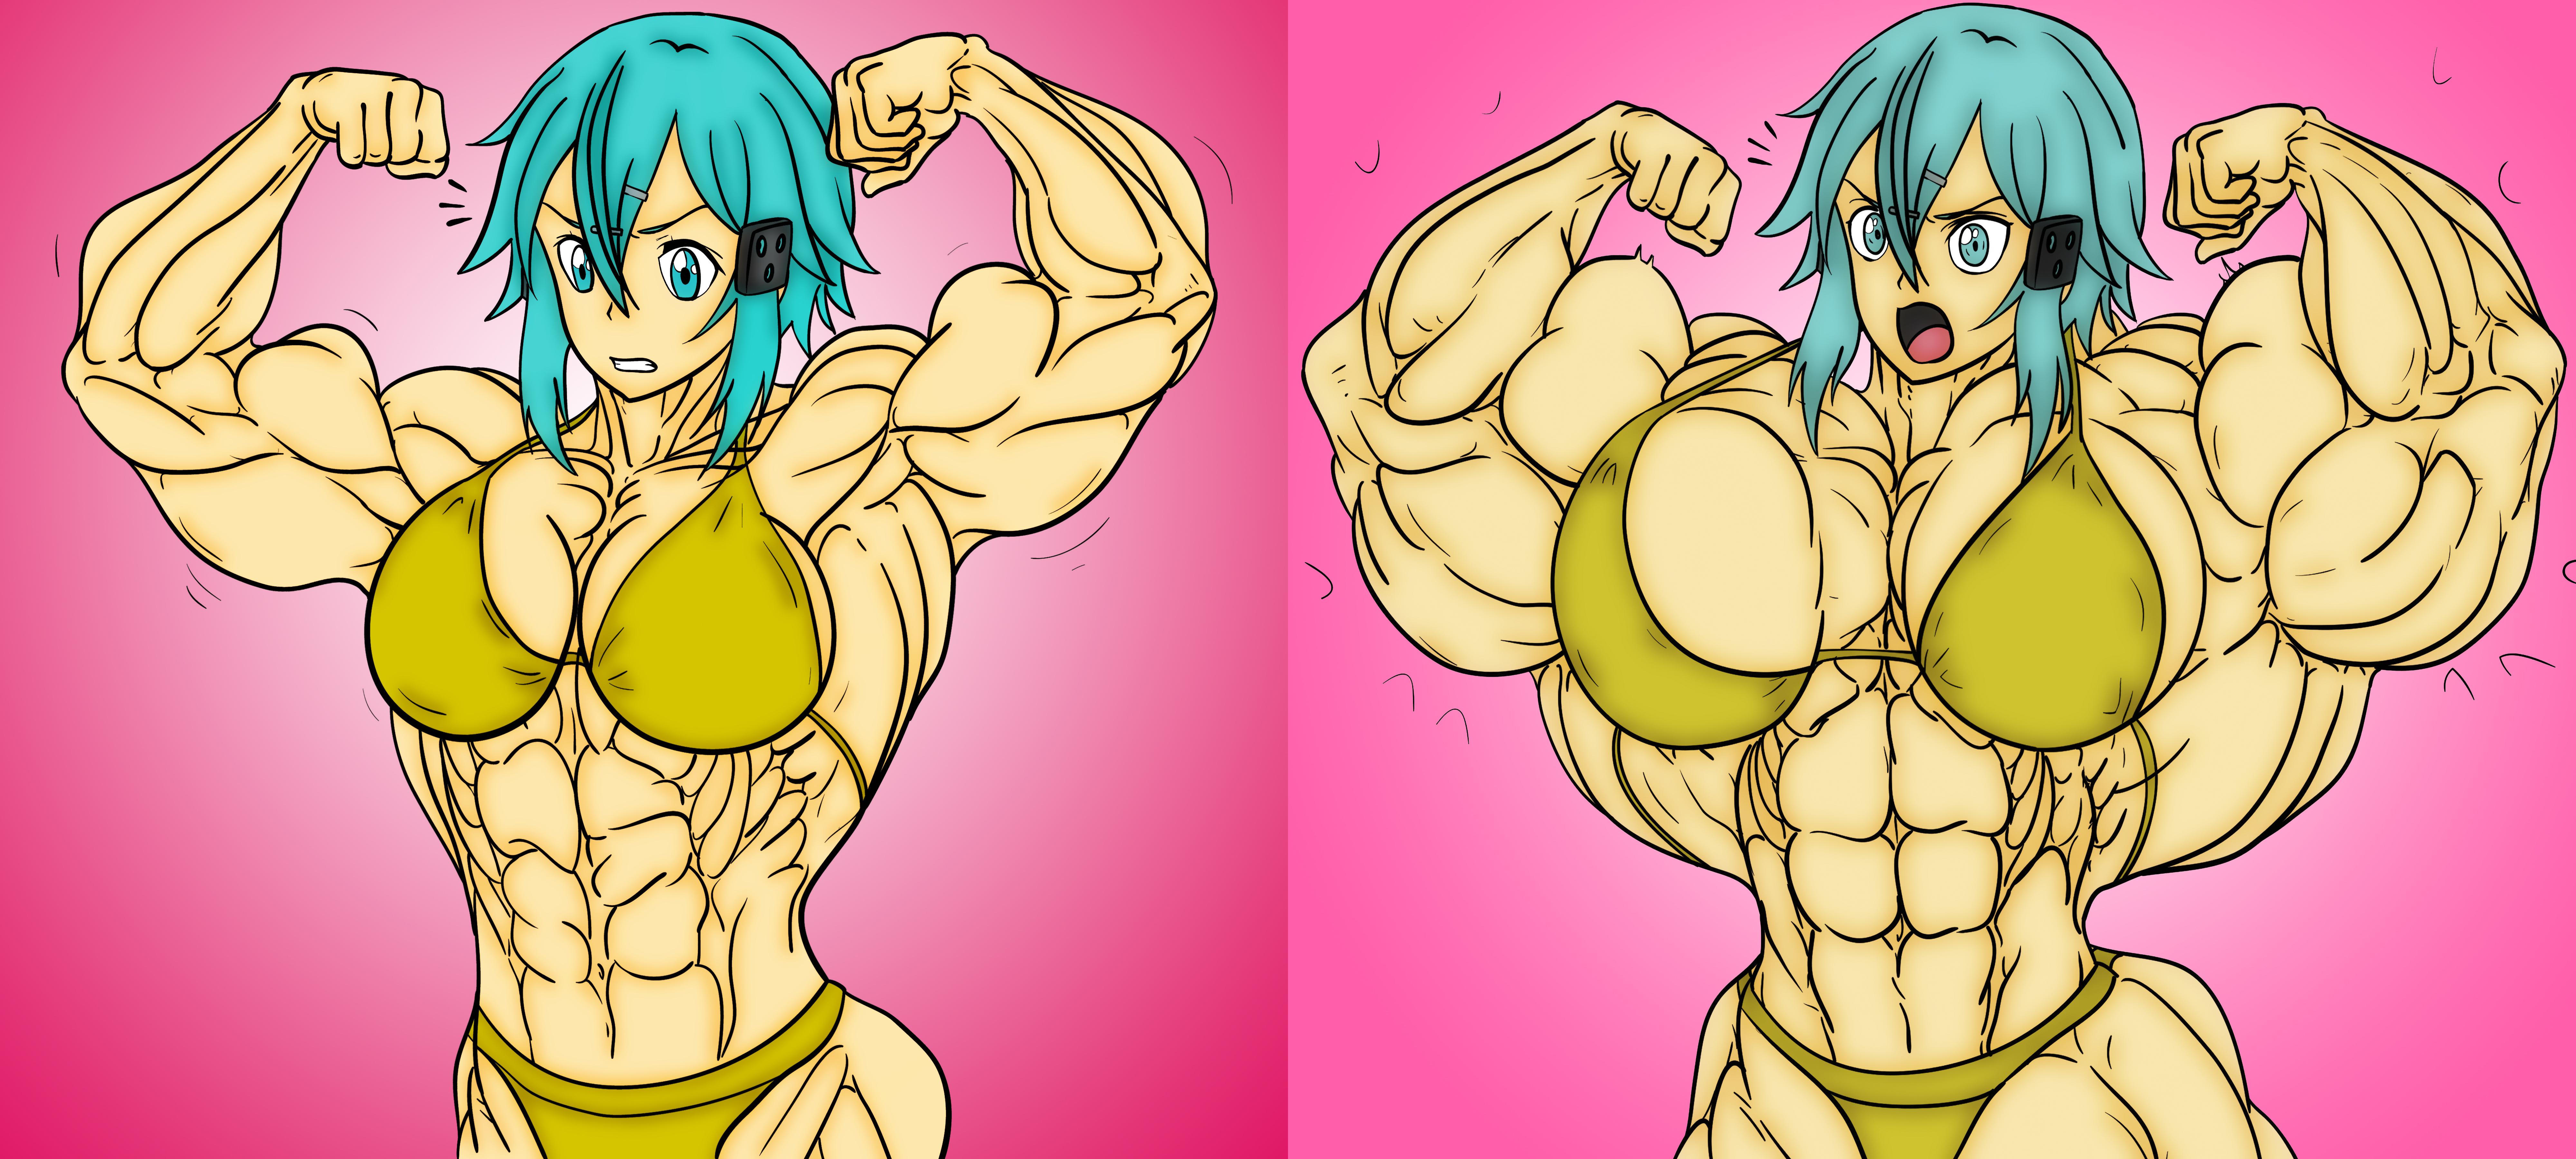 Anime Girl Growth sinon - female muscle growthlauricedeauxnim on deviantart